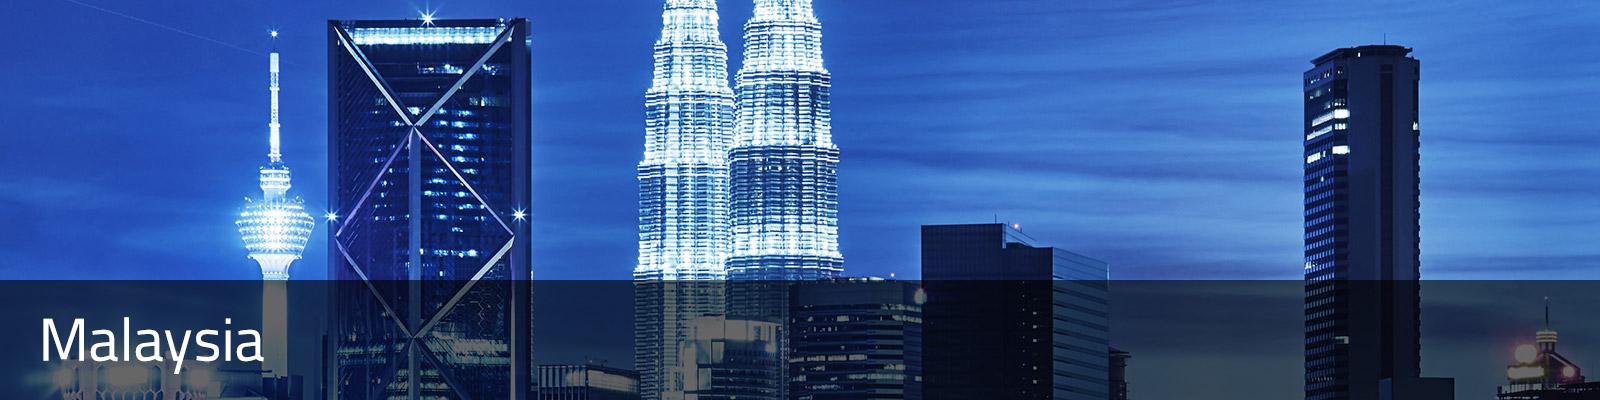 casino recruitment malaysia